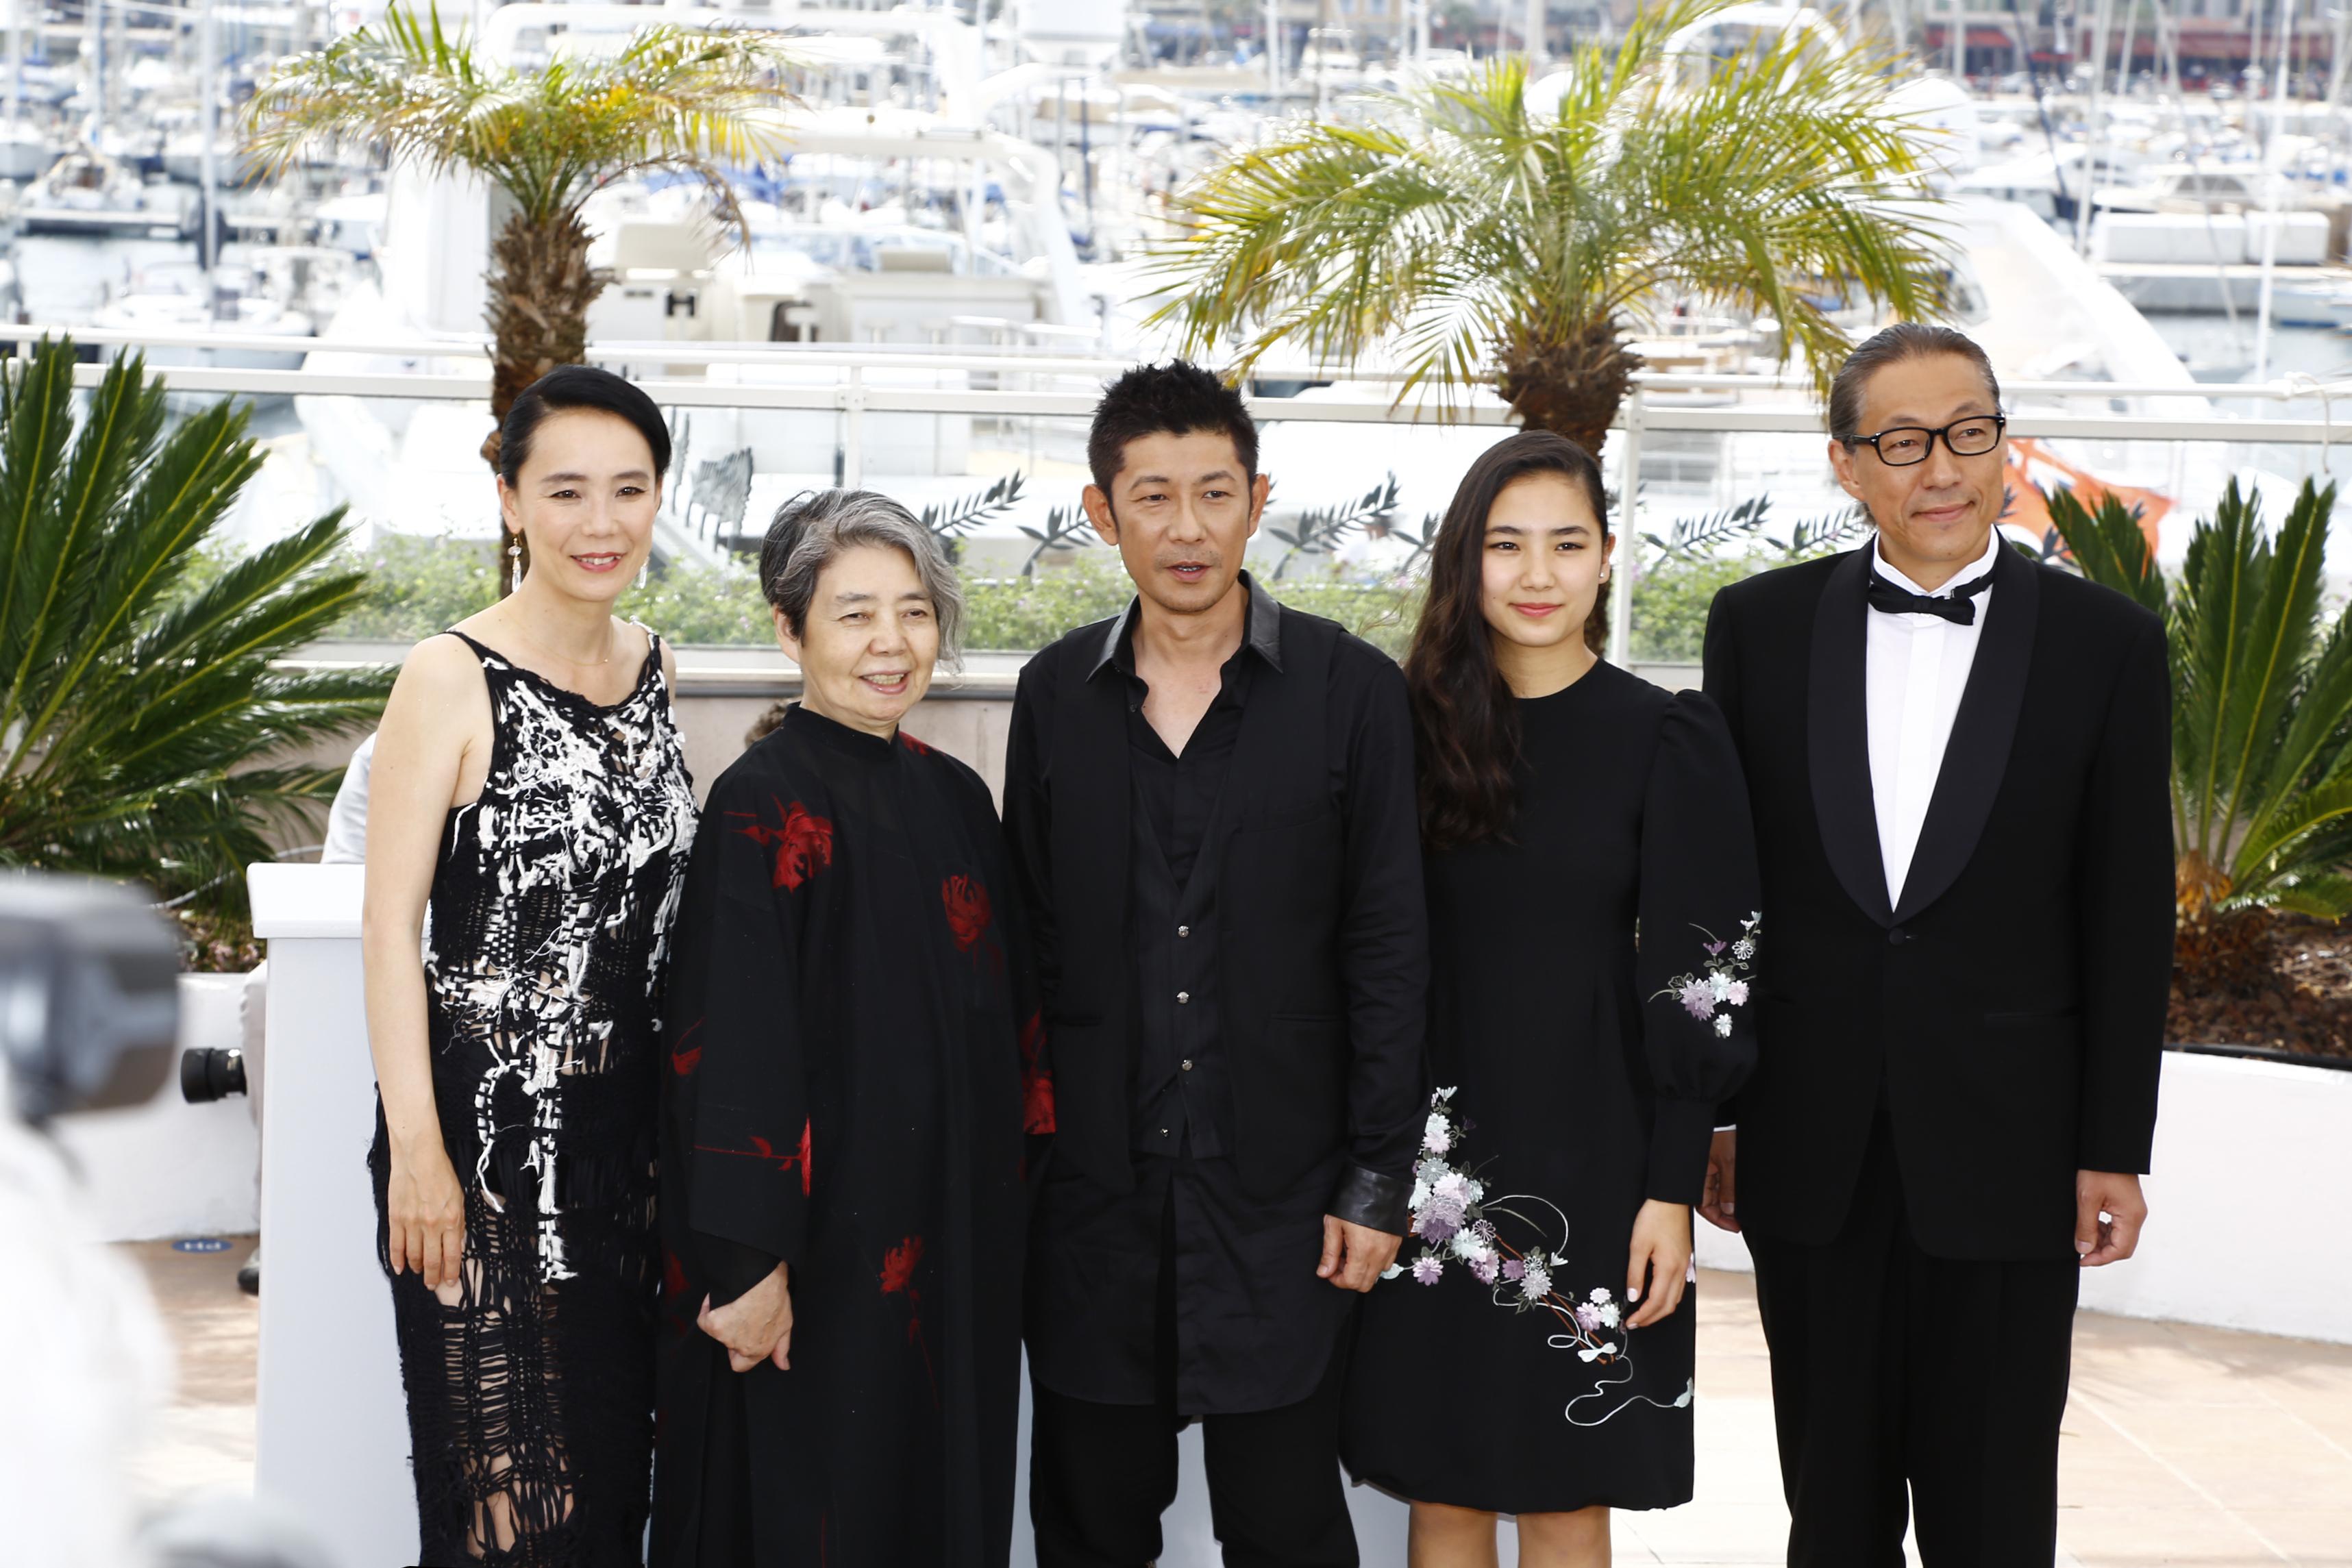 http://www.kawasenaomi.com/kumie/news/Cannes_R4A5633.jpg